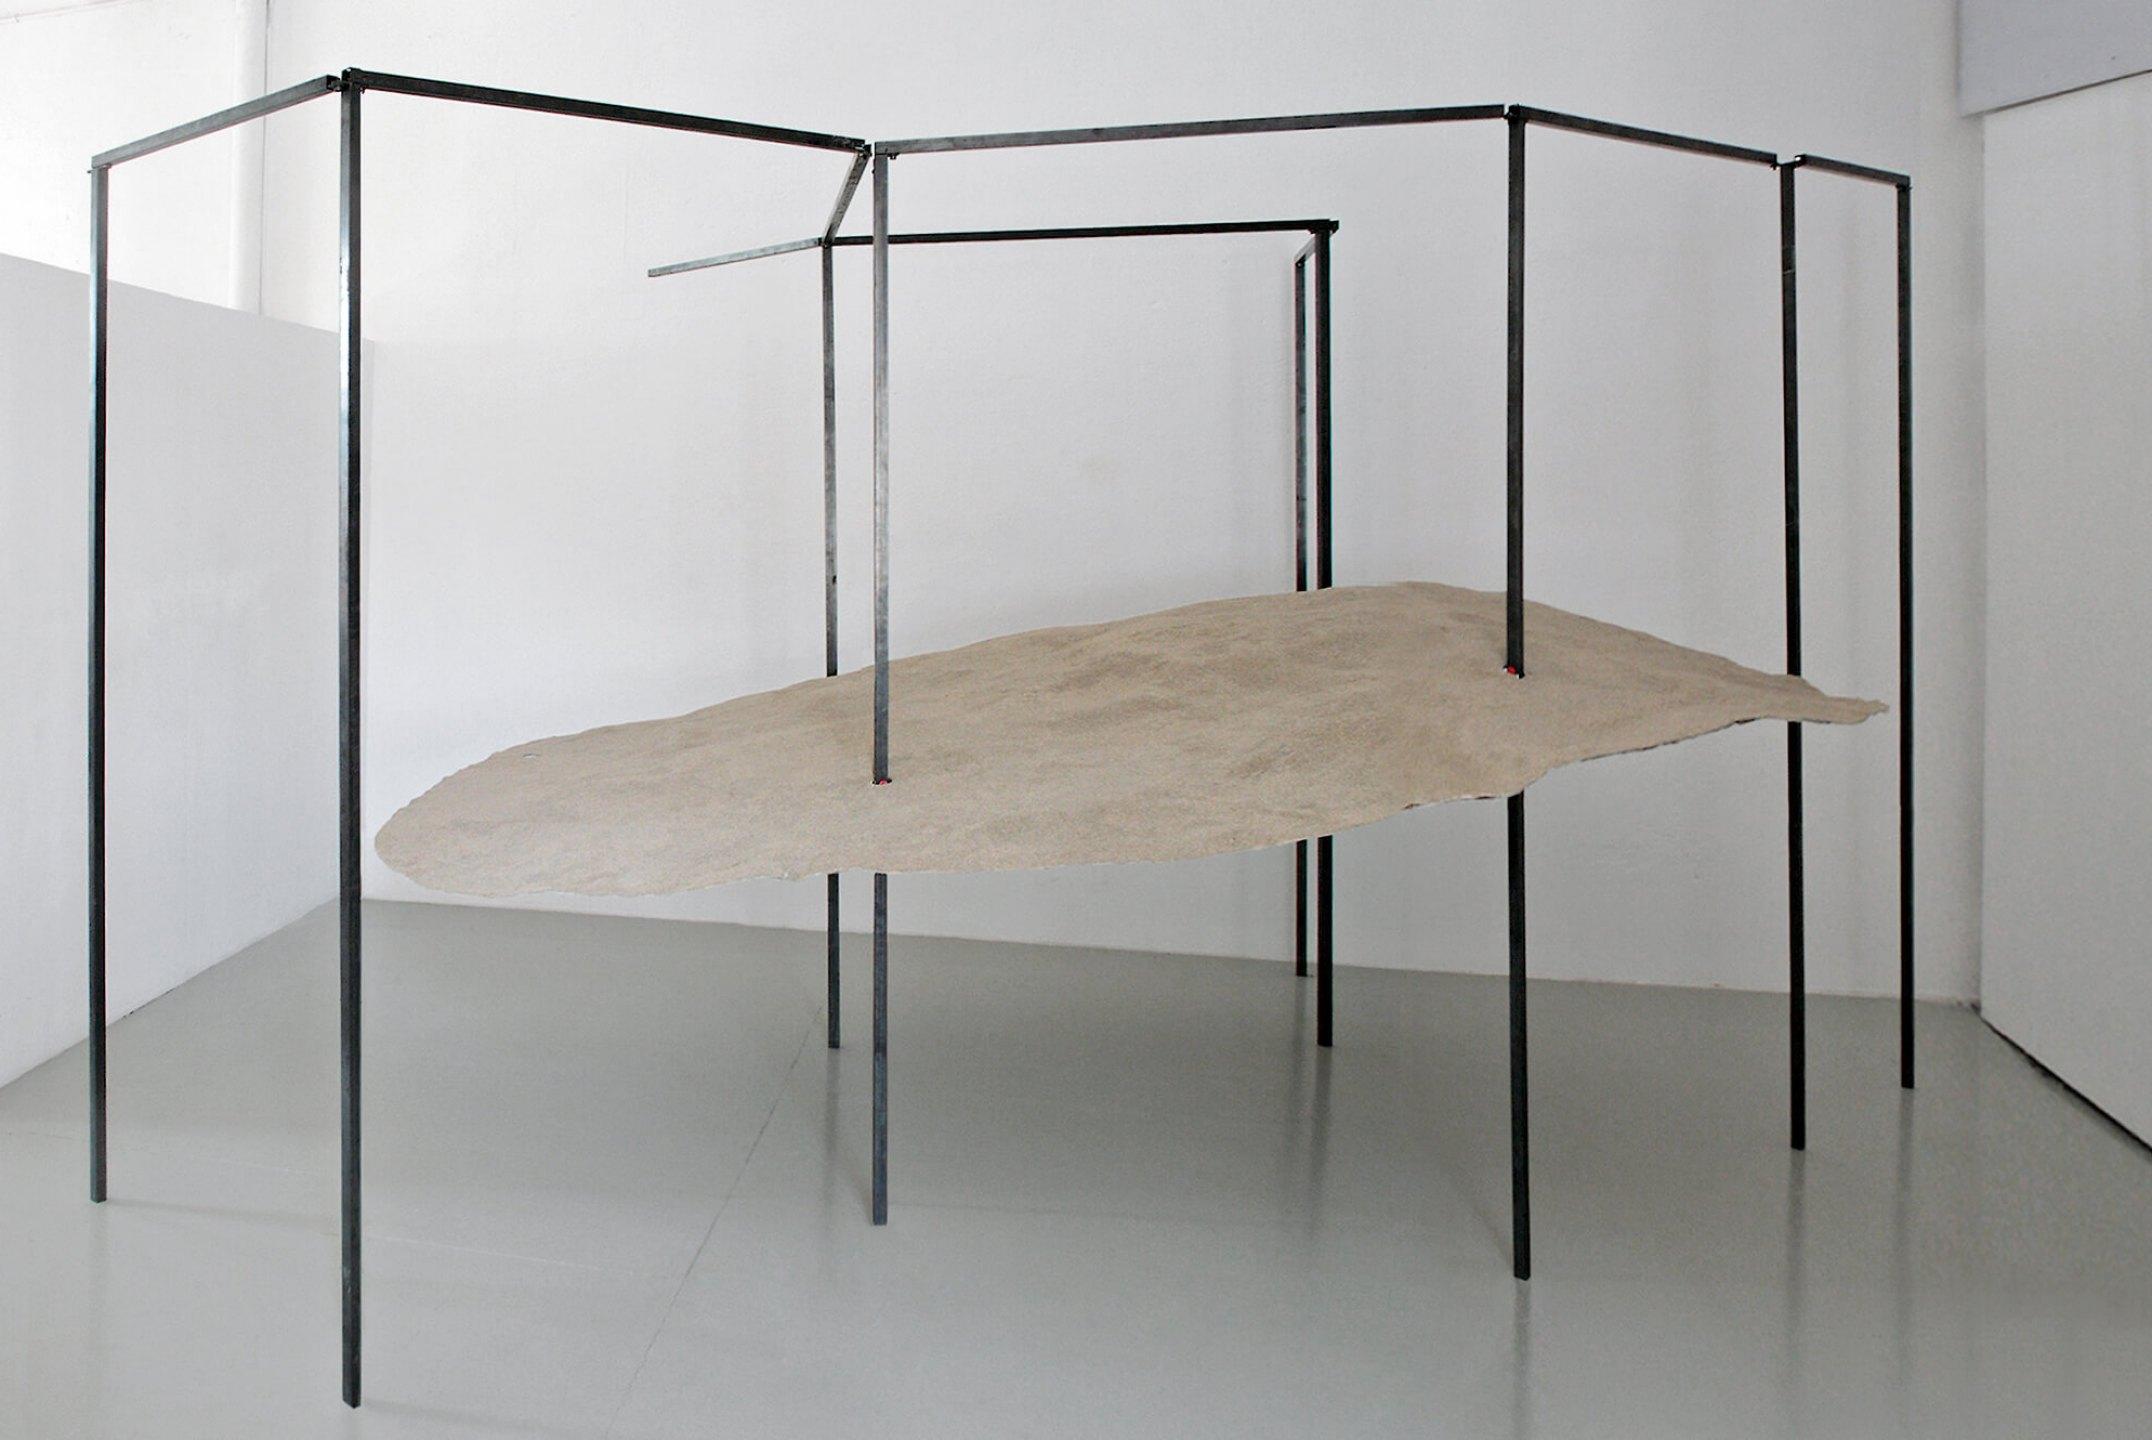 Daniel Steegmann Mangrané, <em>Economic Dune</em>, 2012, fiberglass and sand, 3,50 × 2,50 ×1 m - Mendes Wood DM